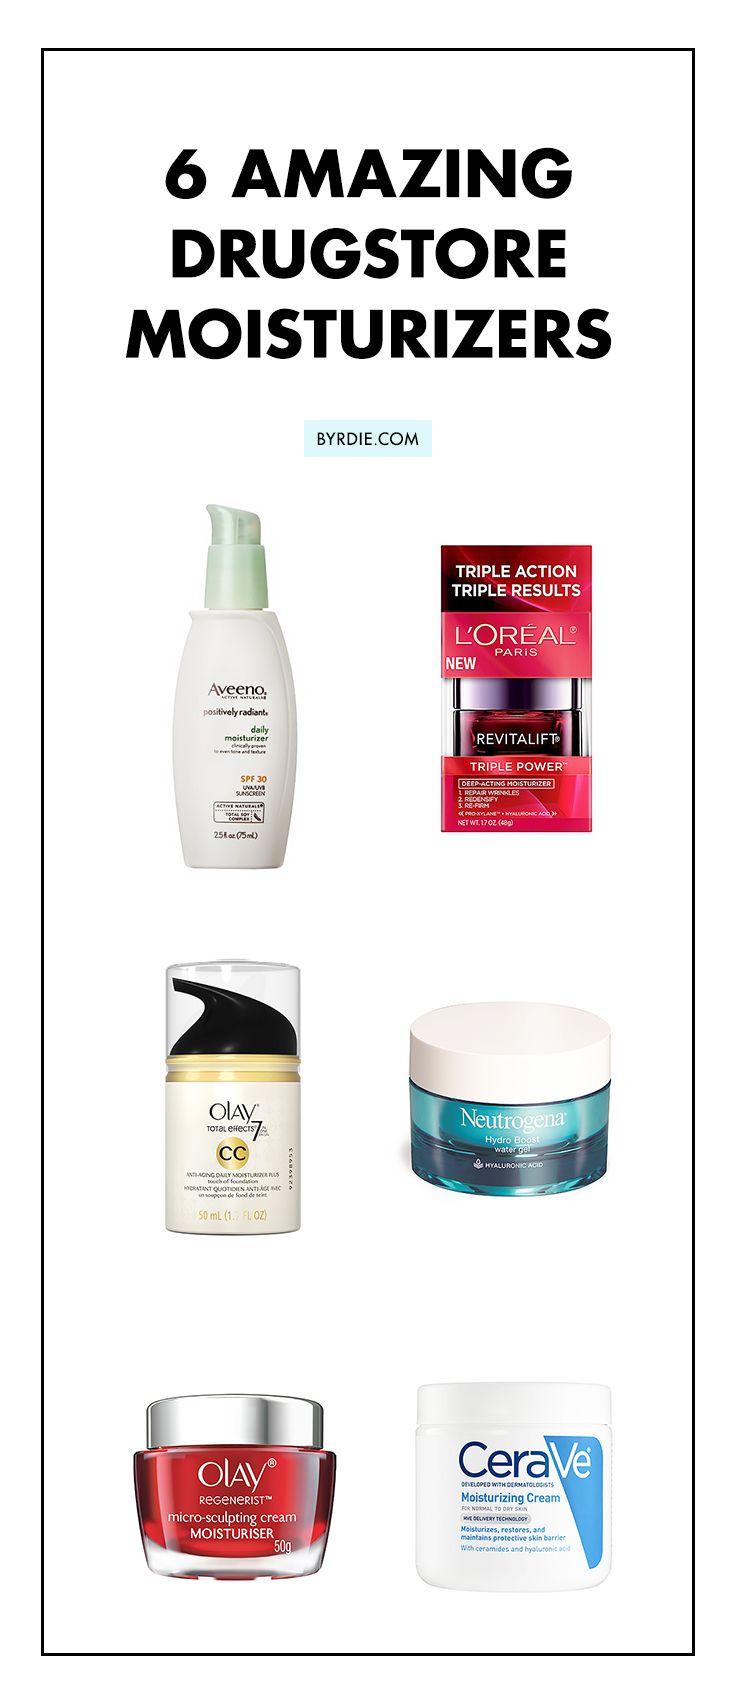 6 popular drugstore moisturizers